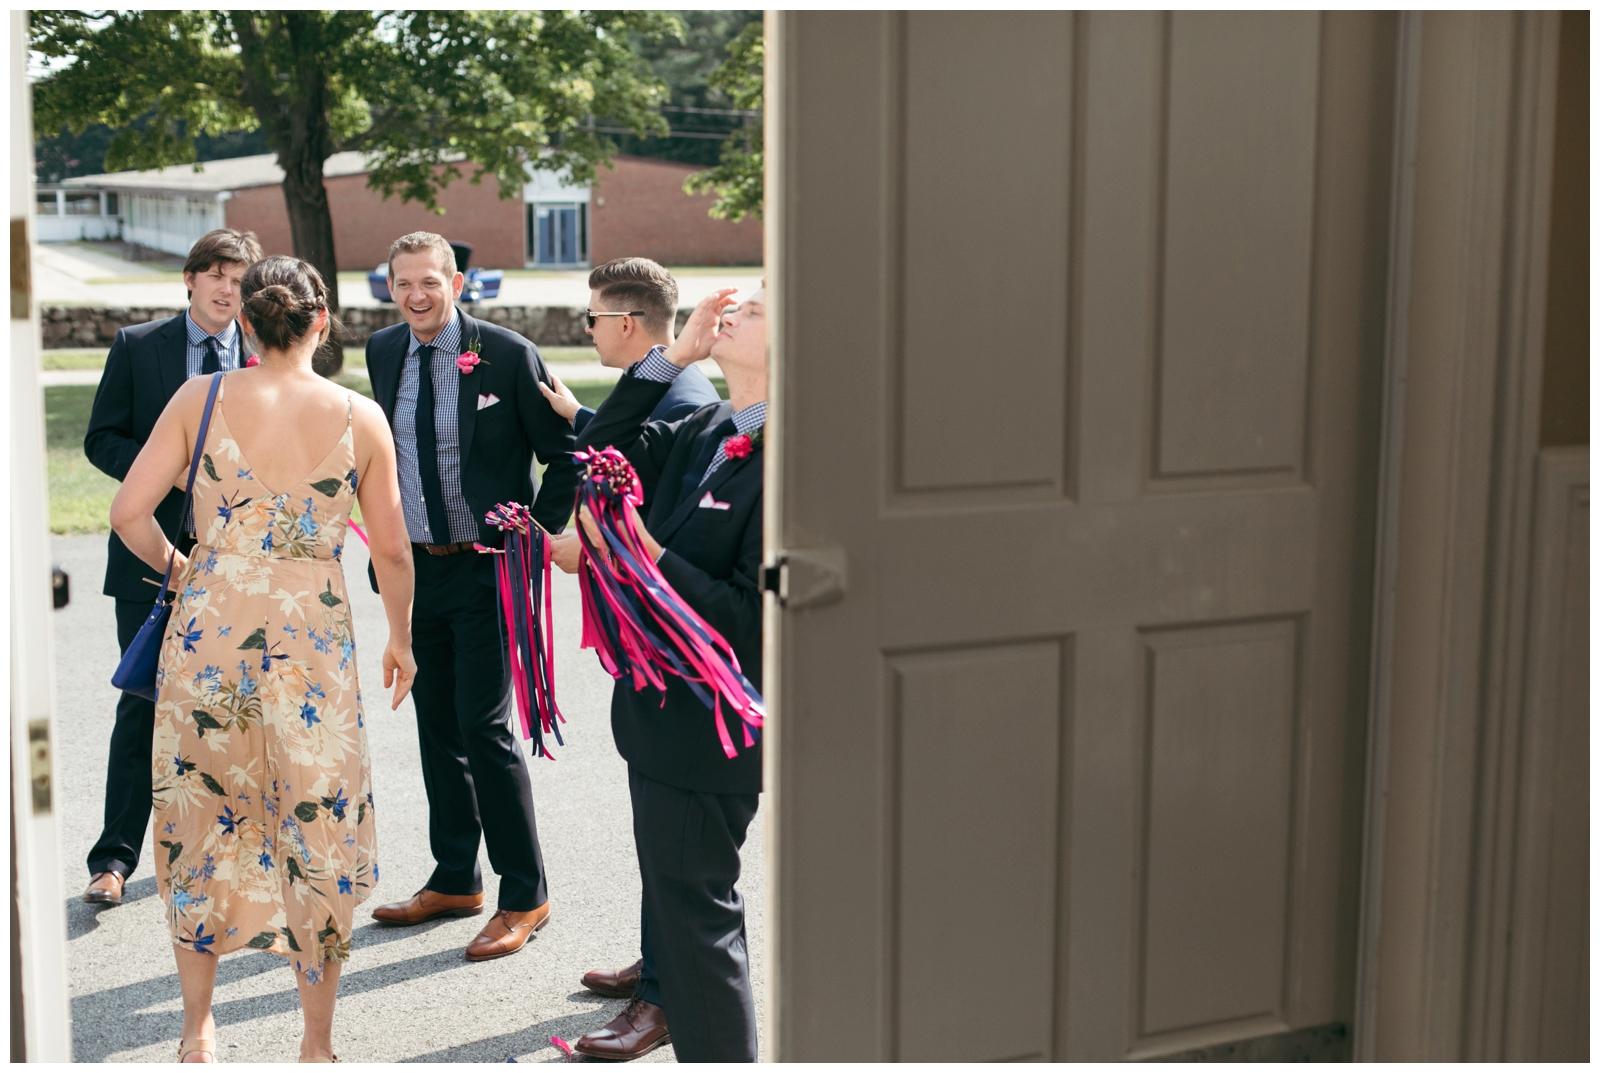 Bailey-Q-Photo-Backyard-Wedding-South-Shore-Boston-Wedding-Photographer-029.jpg